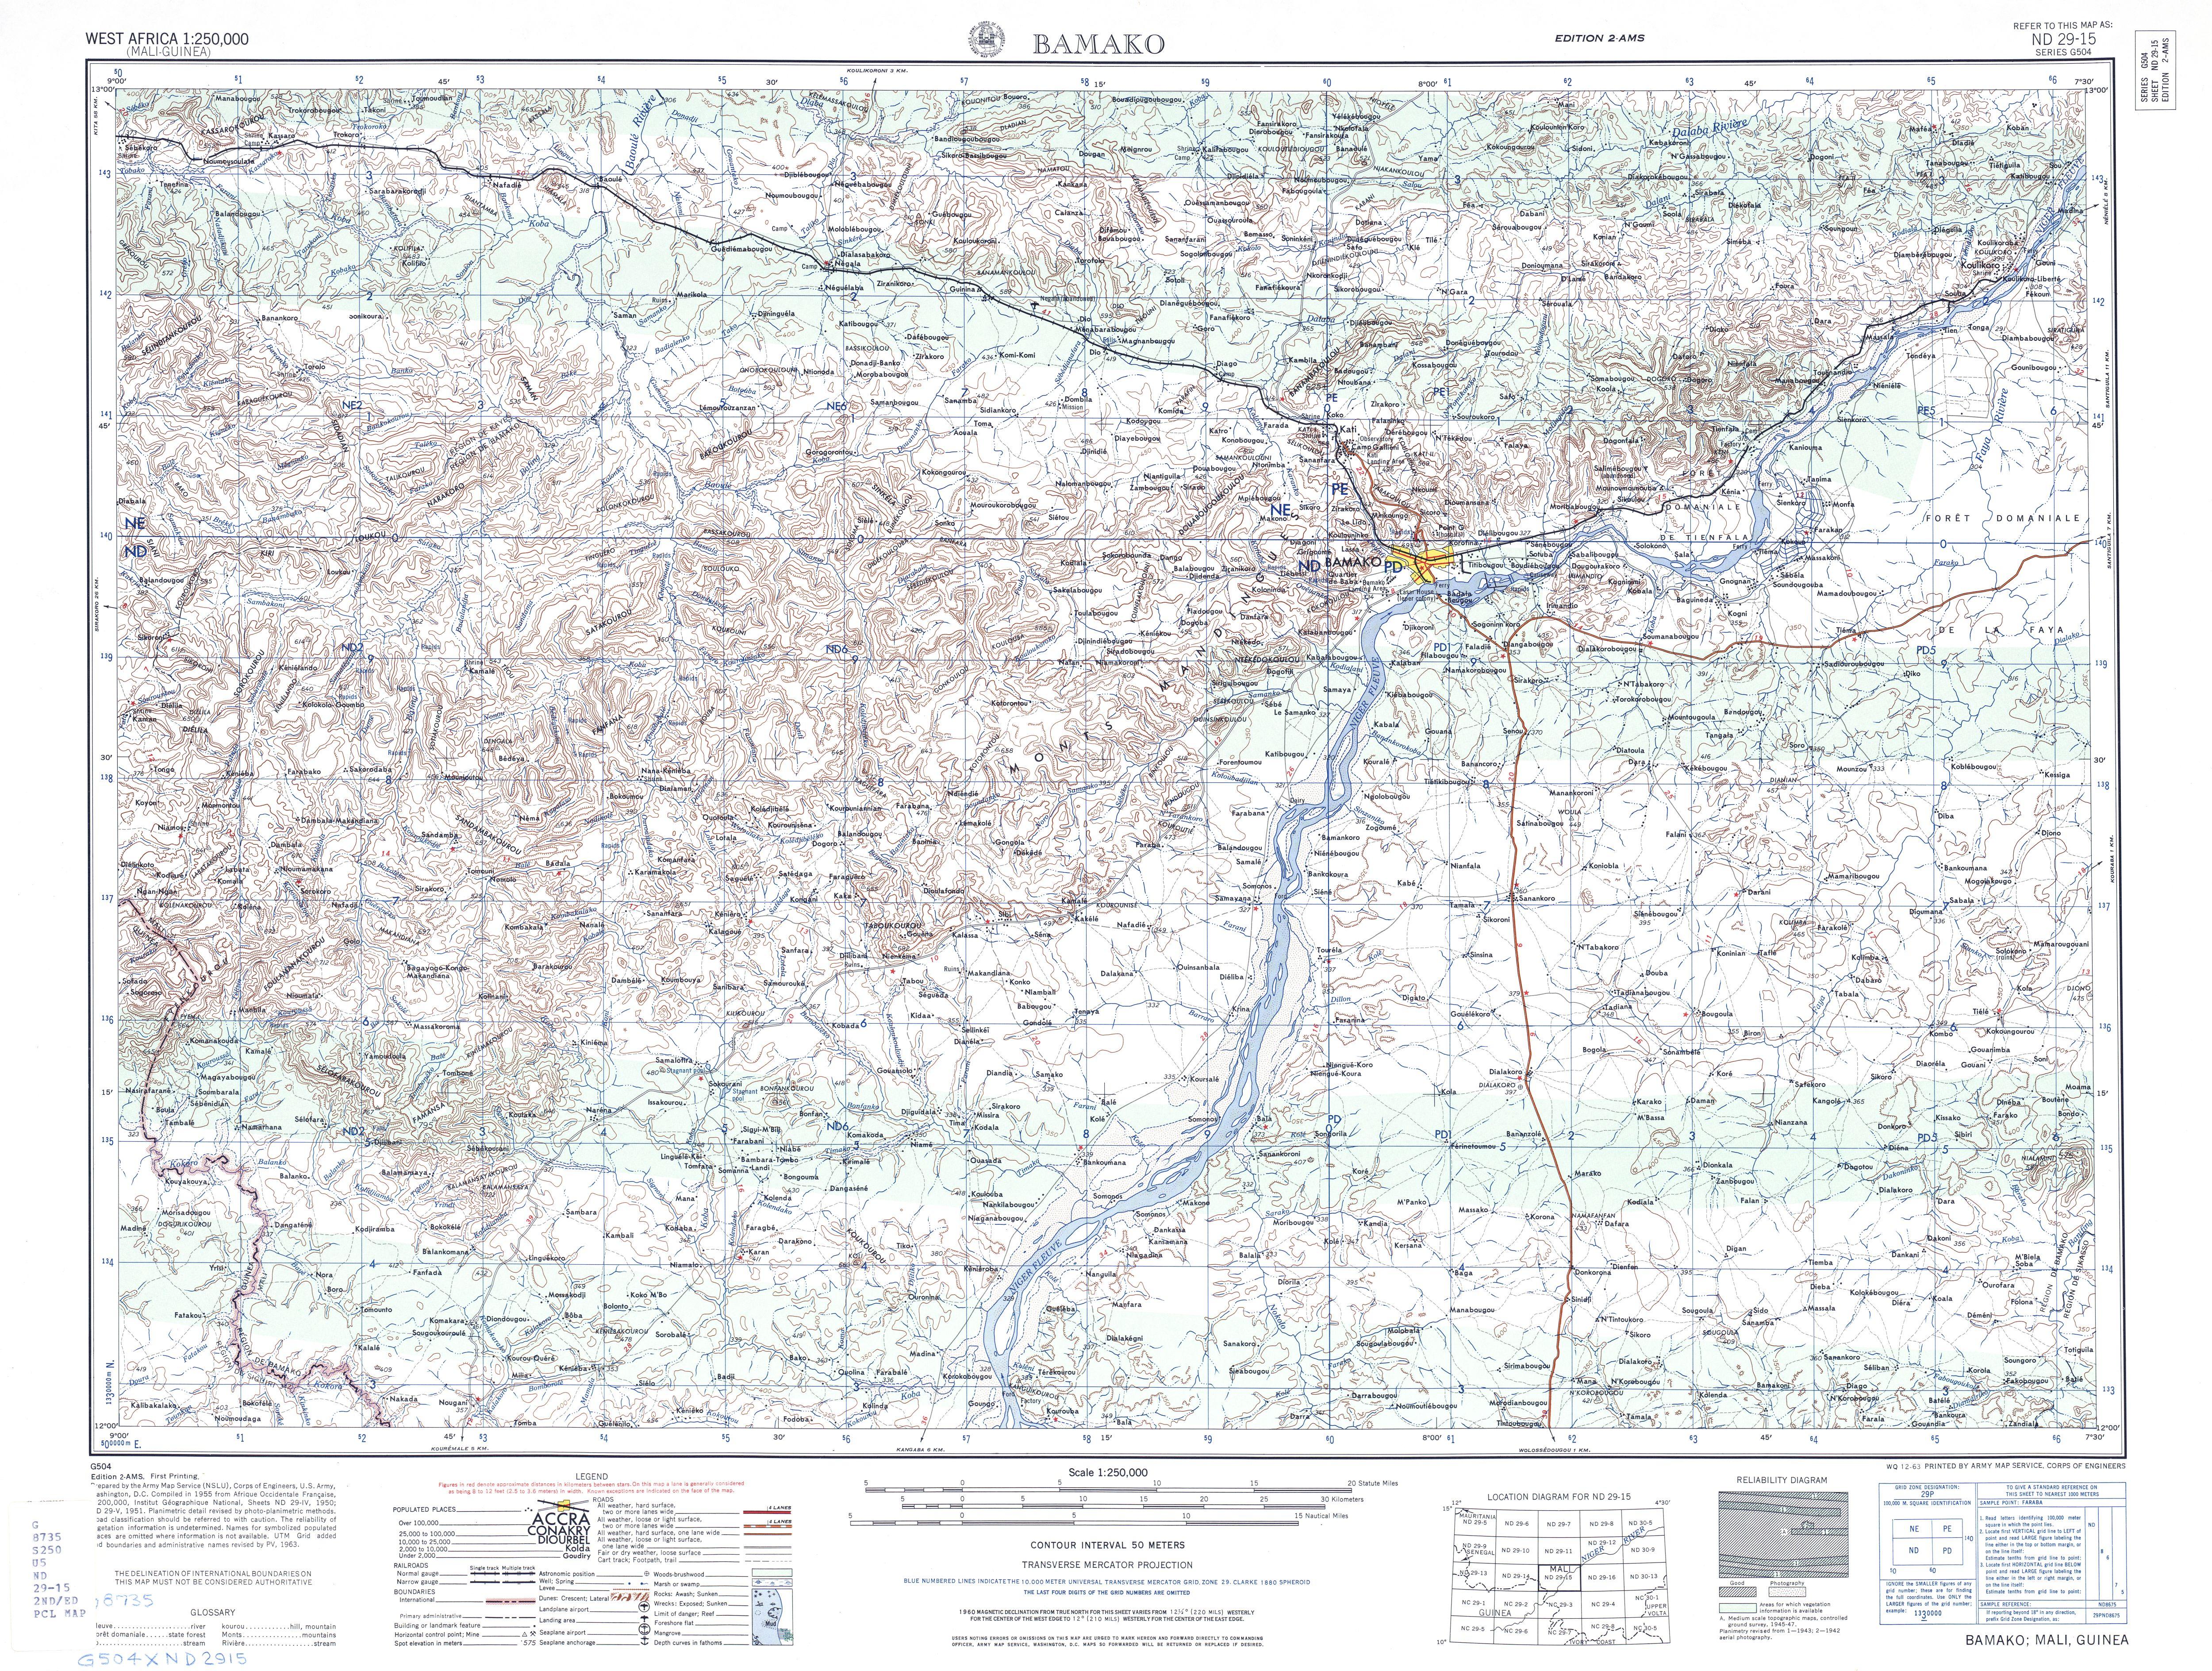 Hoja Bamako del Mapa Topográfico de África Occidental 1955